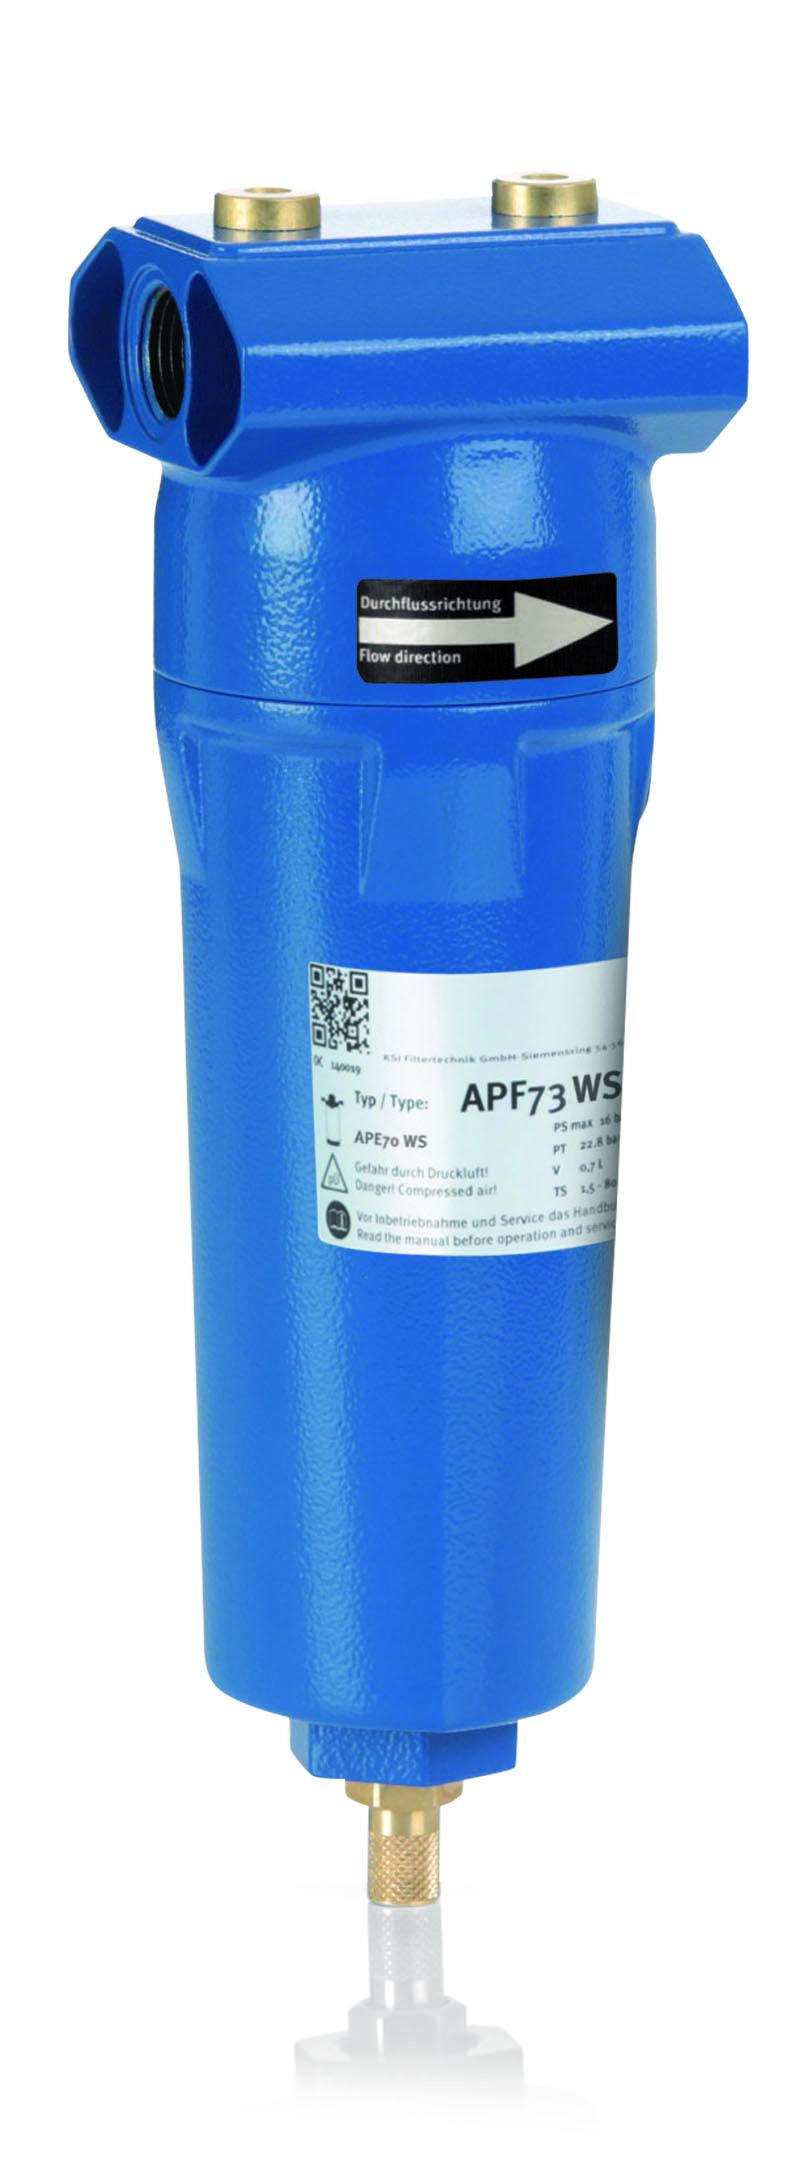 KSI Filtertechnik Water separators Threaded connection